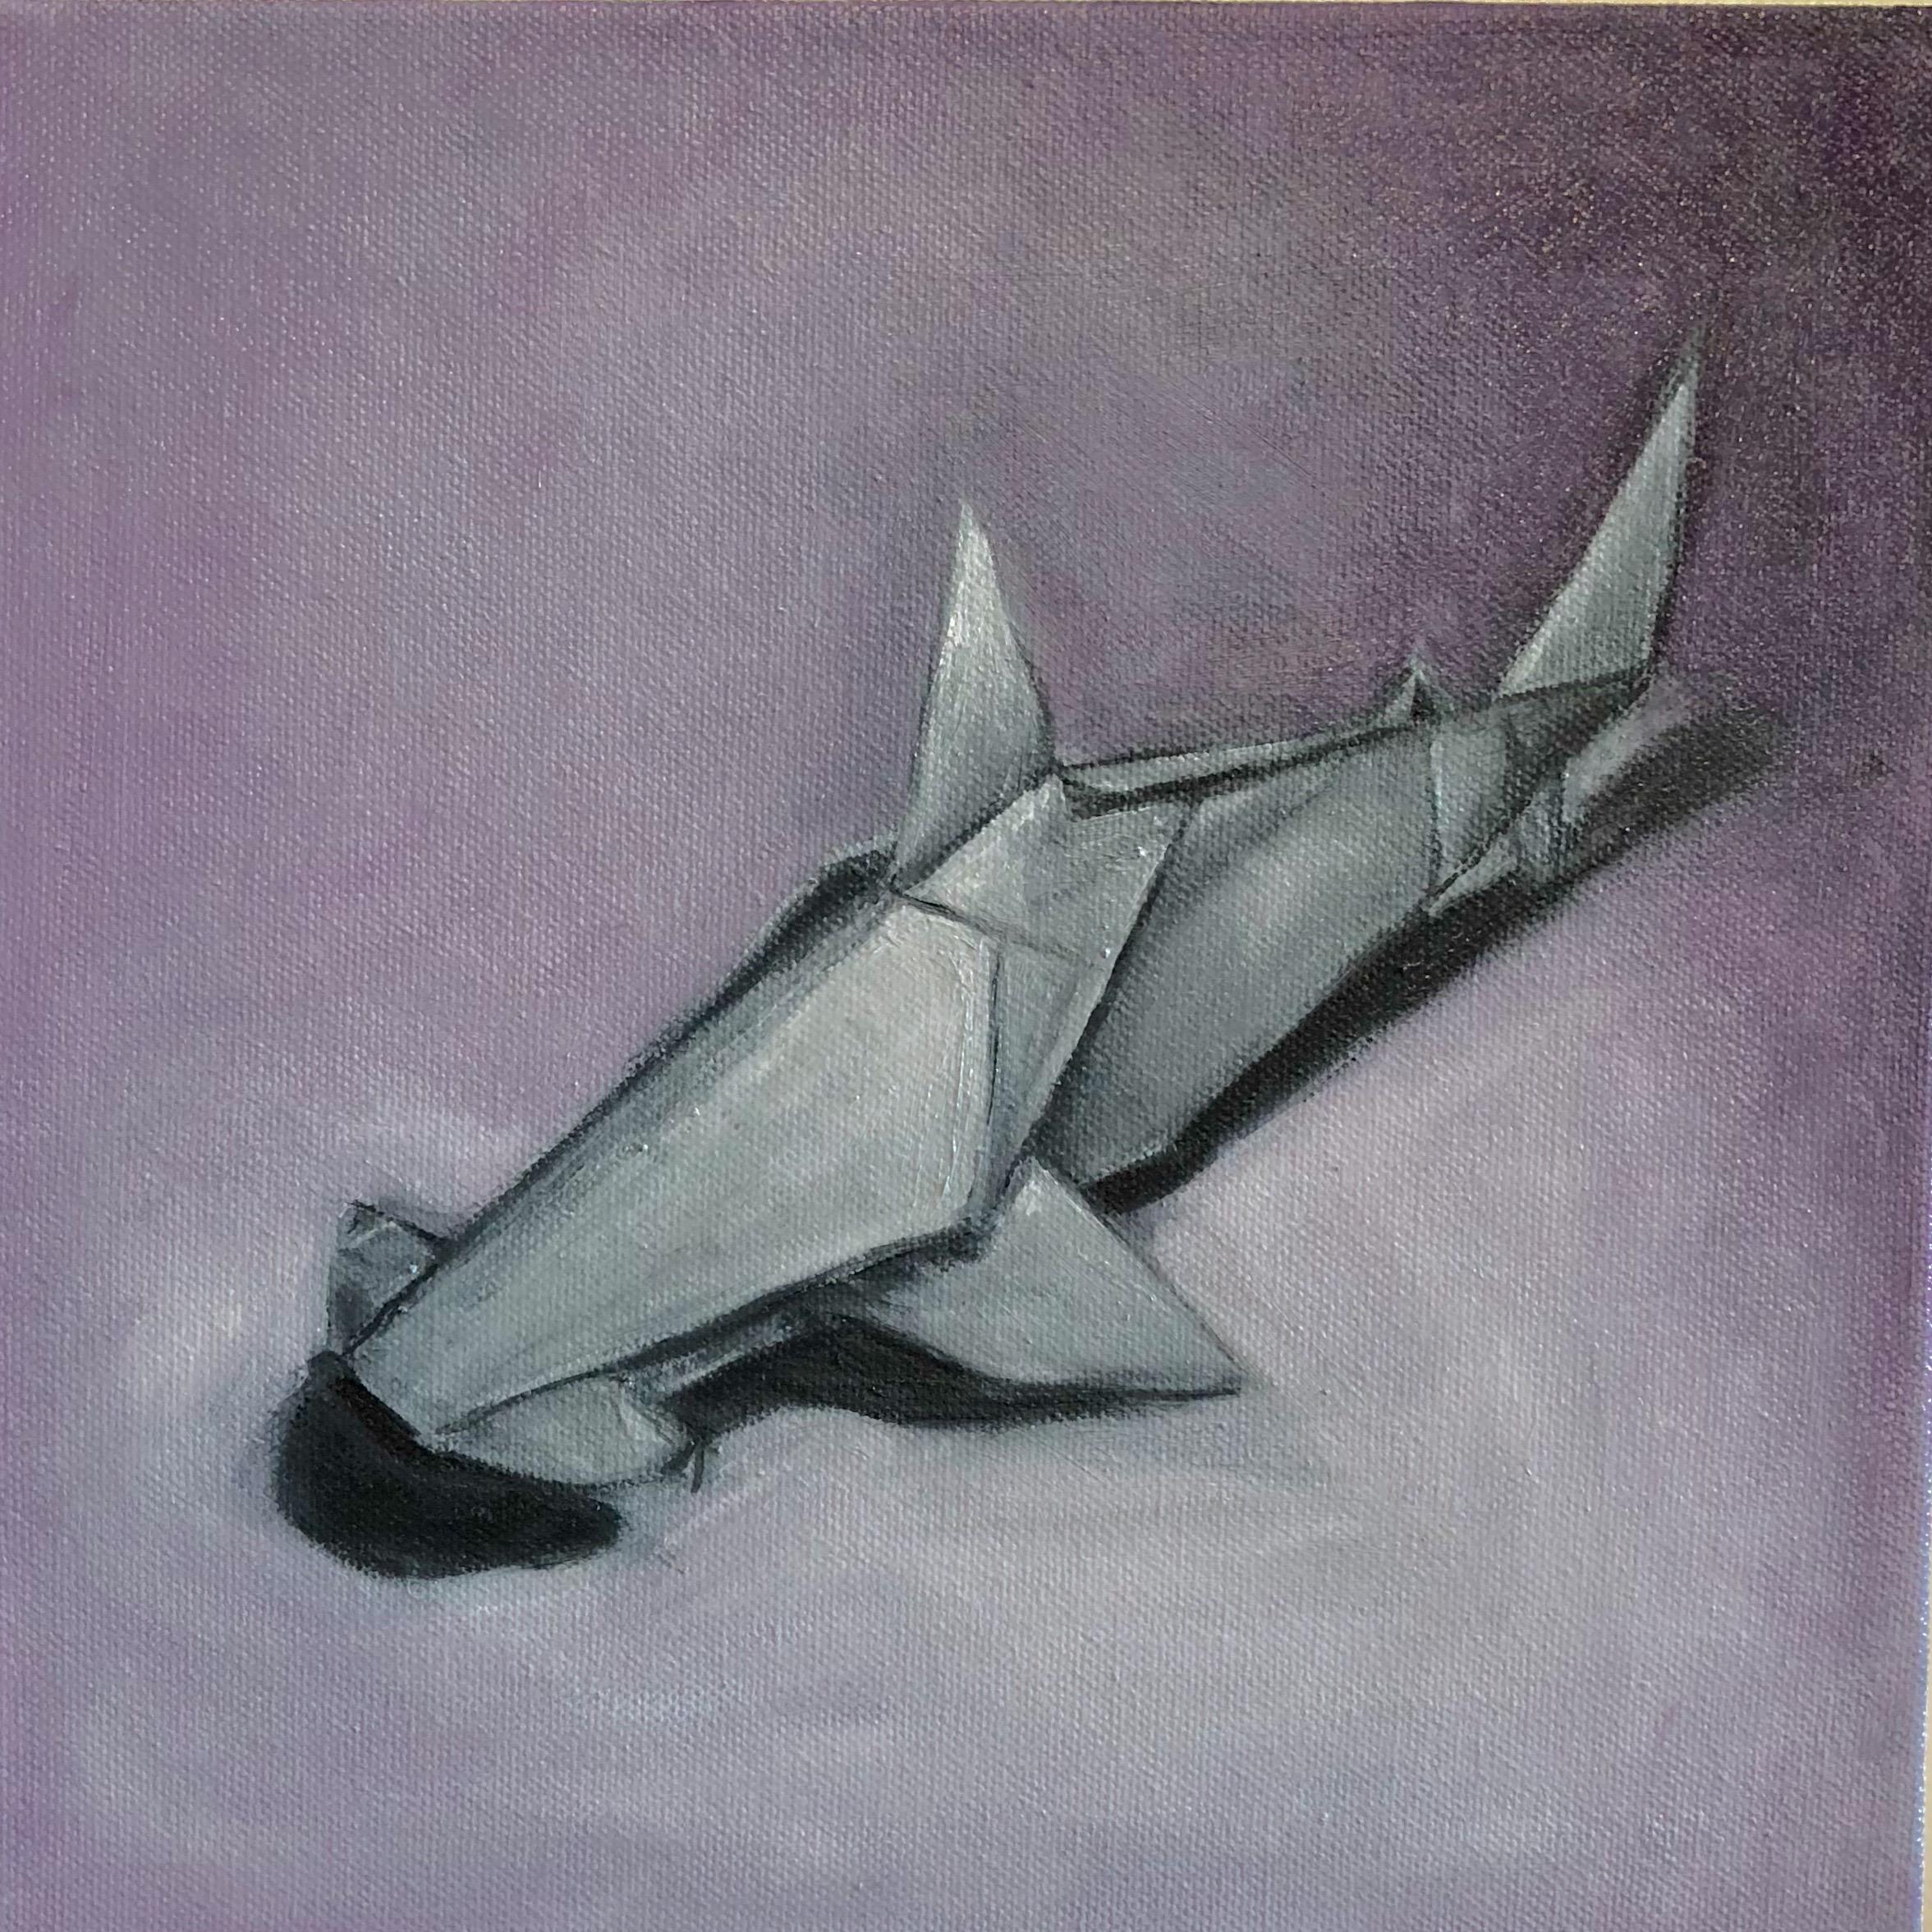 Origami Hammerhead